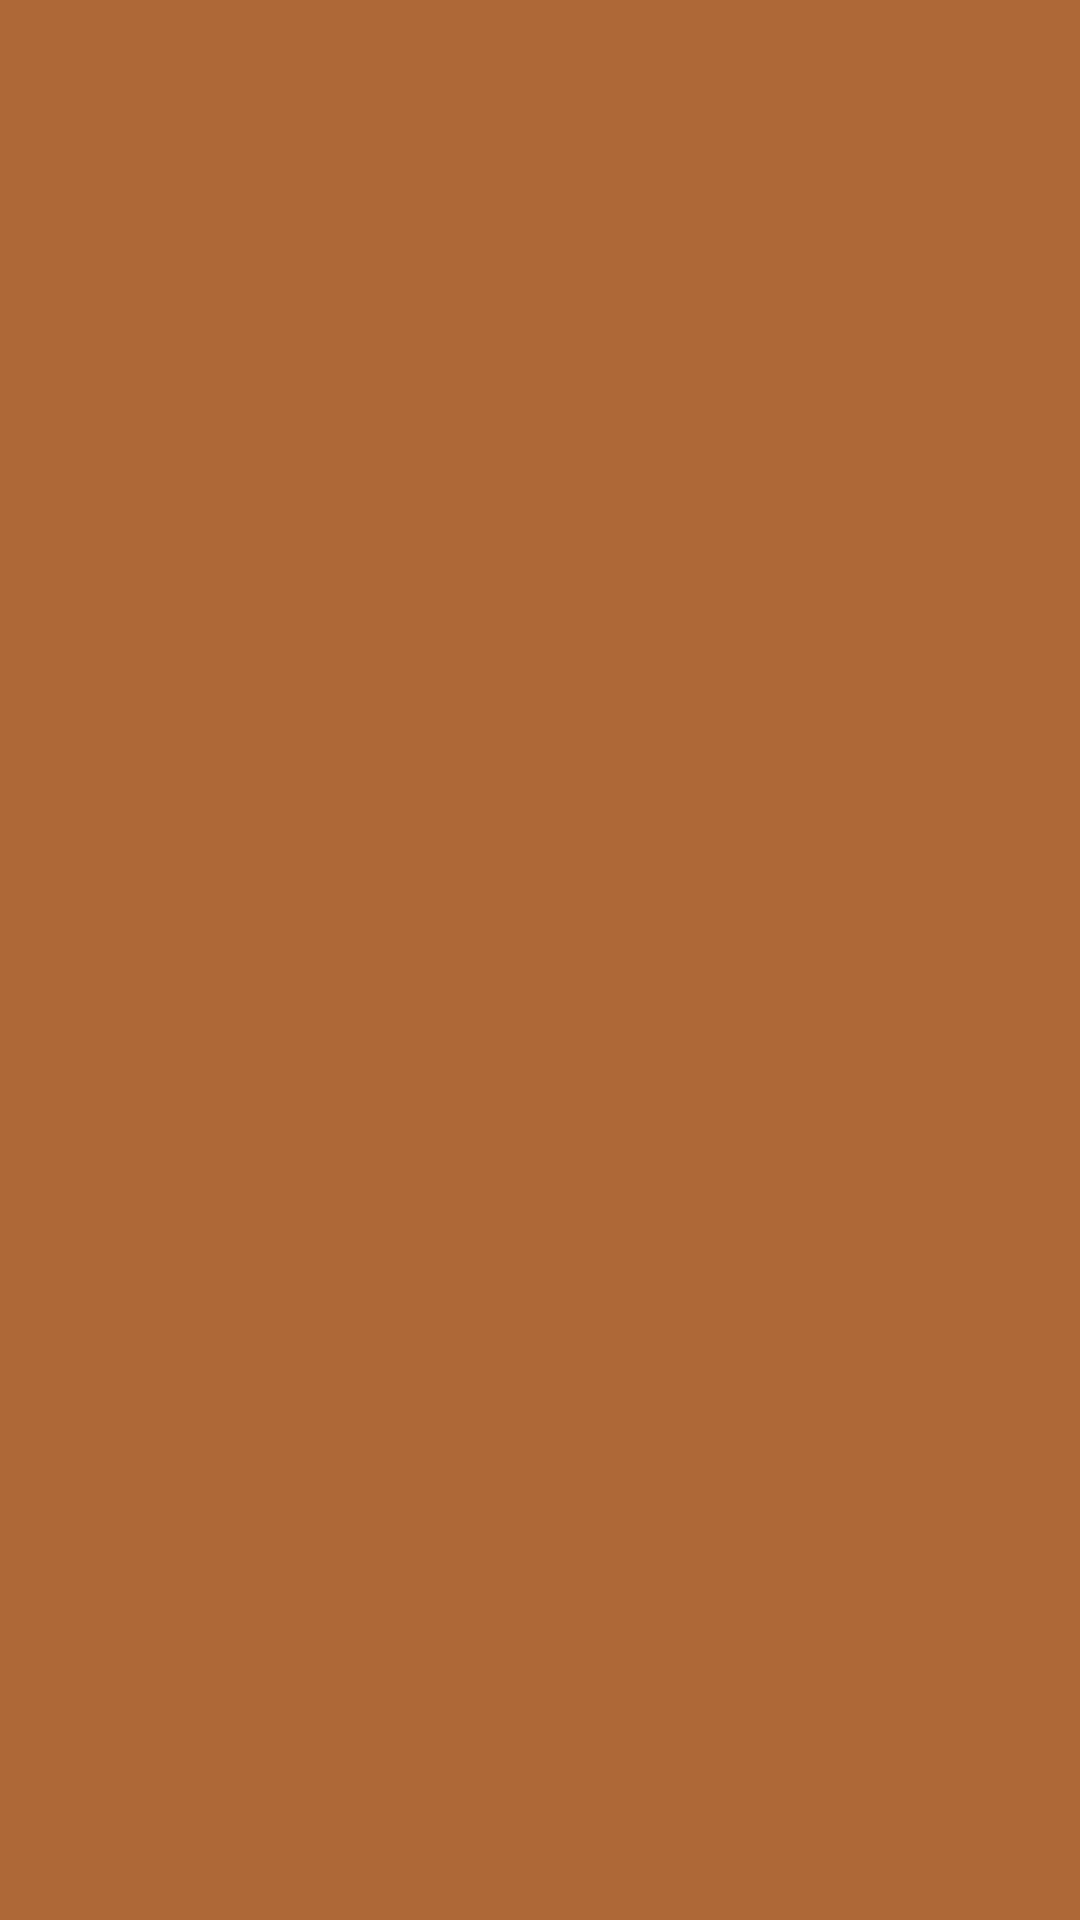 1080x1920 Windsor Tan Solid Color Background